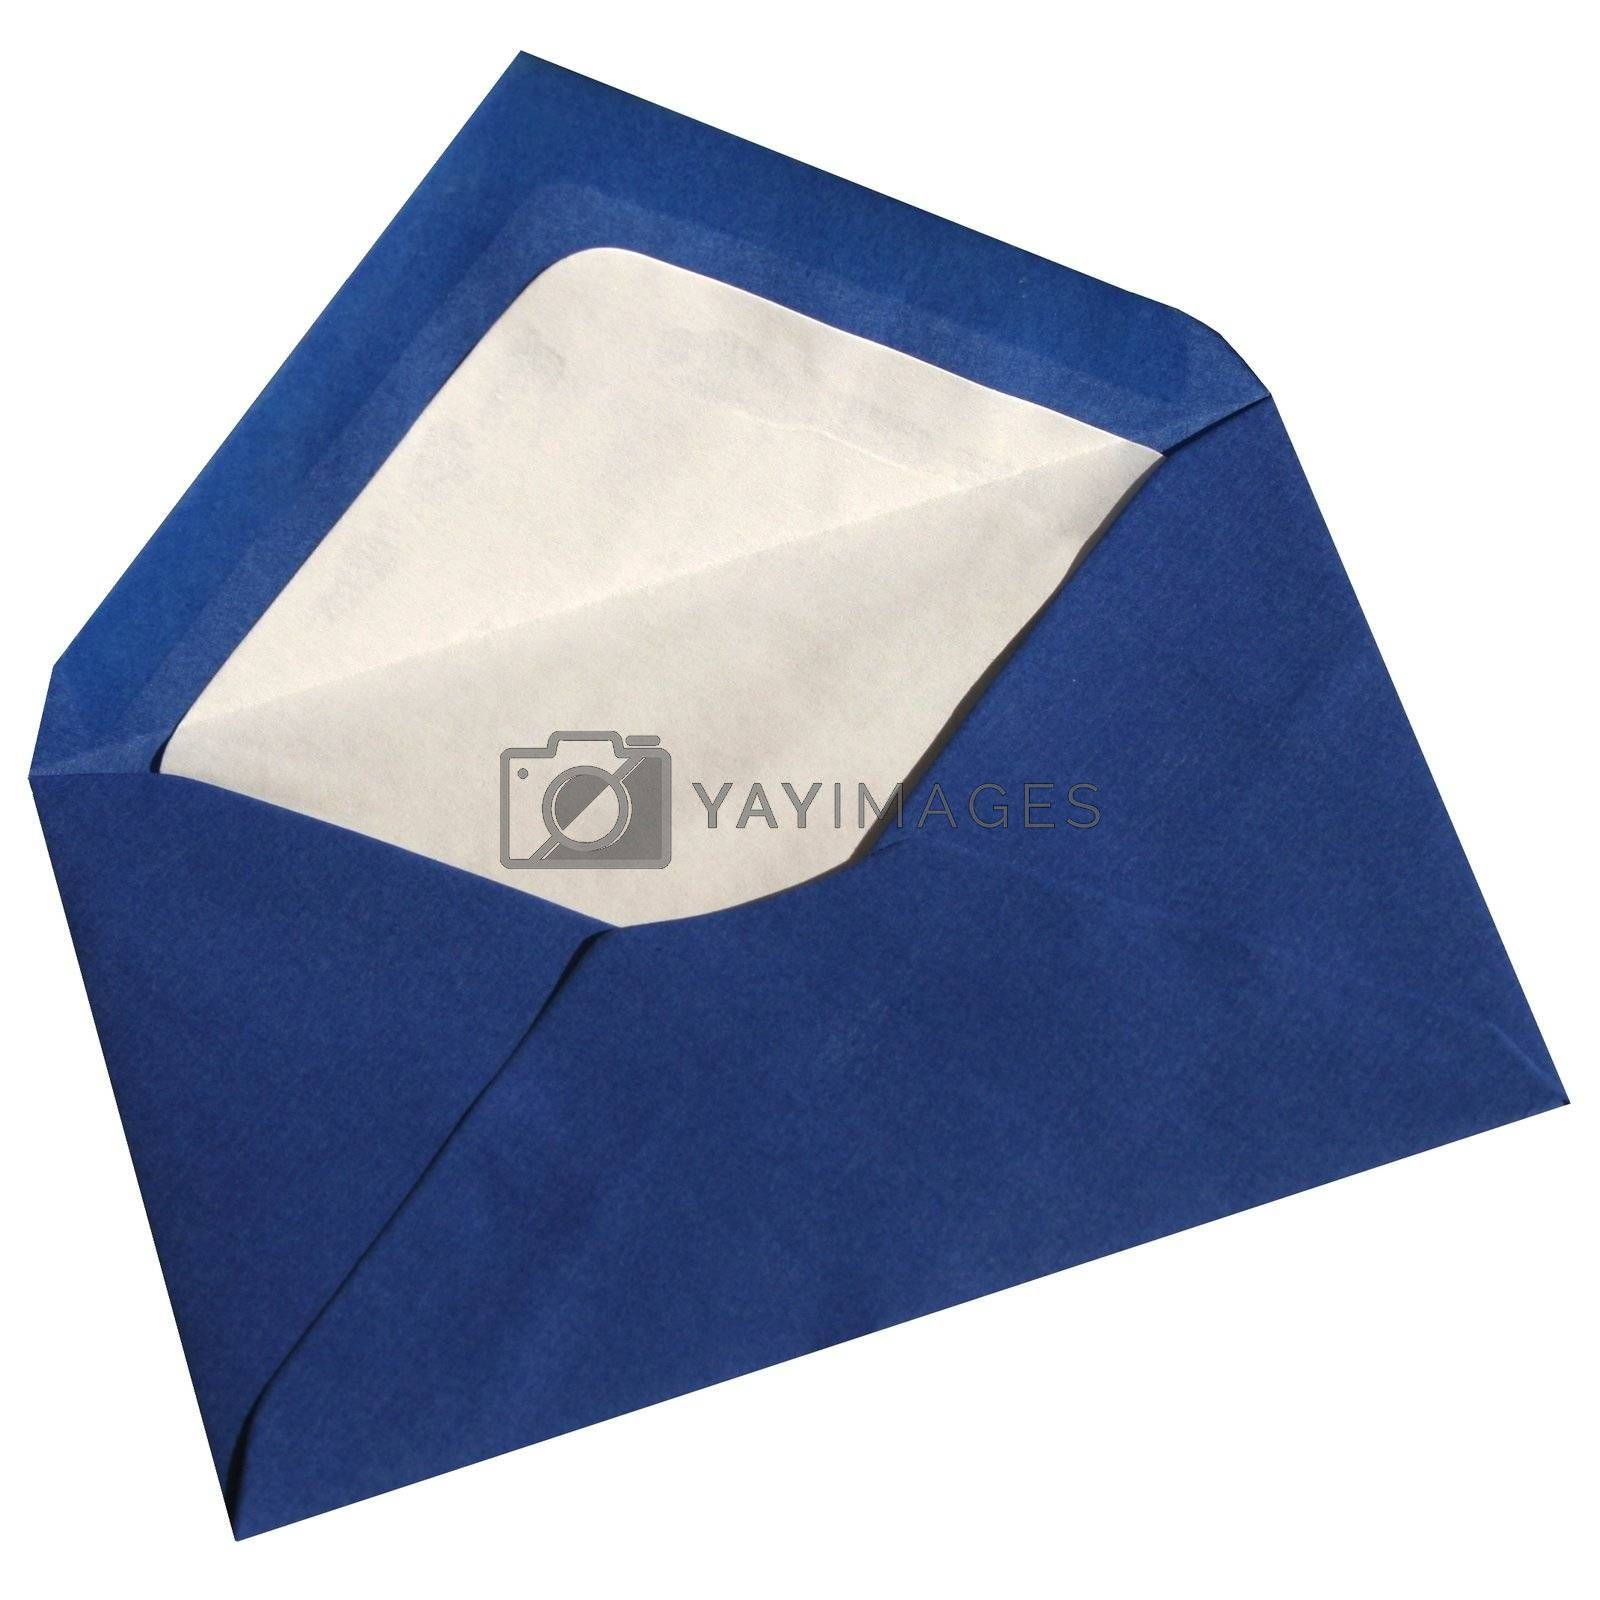 Bleu envelope open isolated on white background